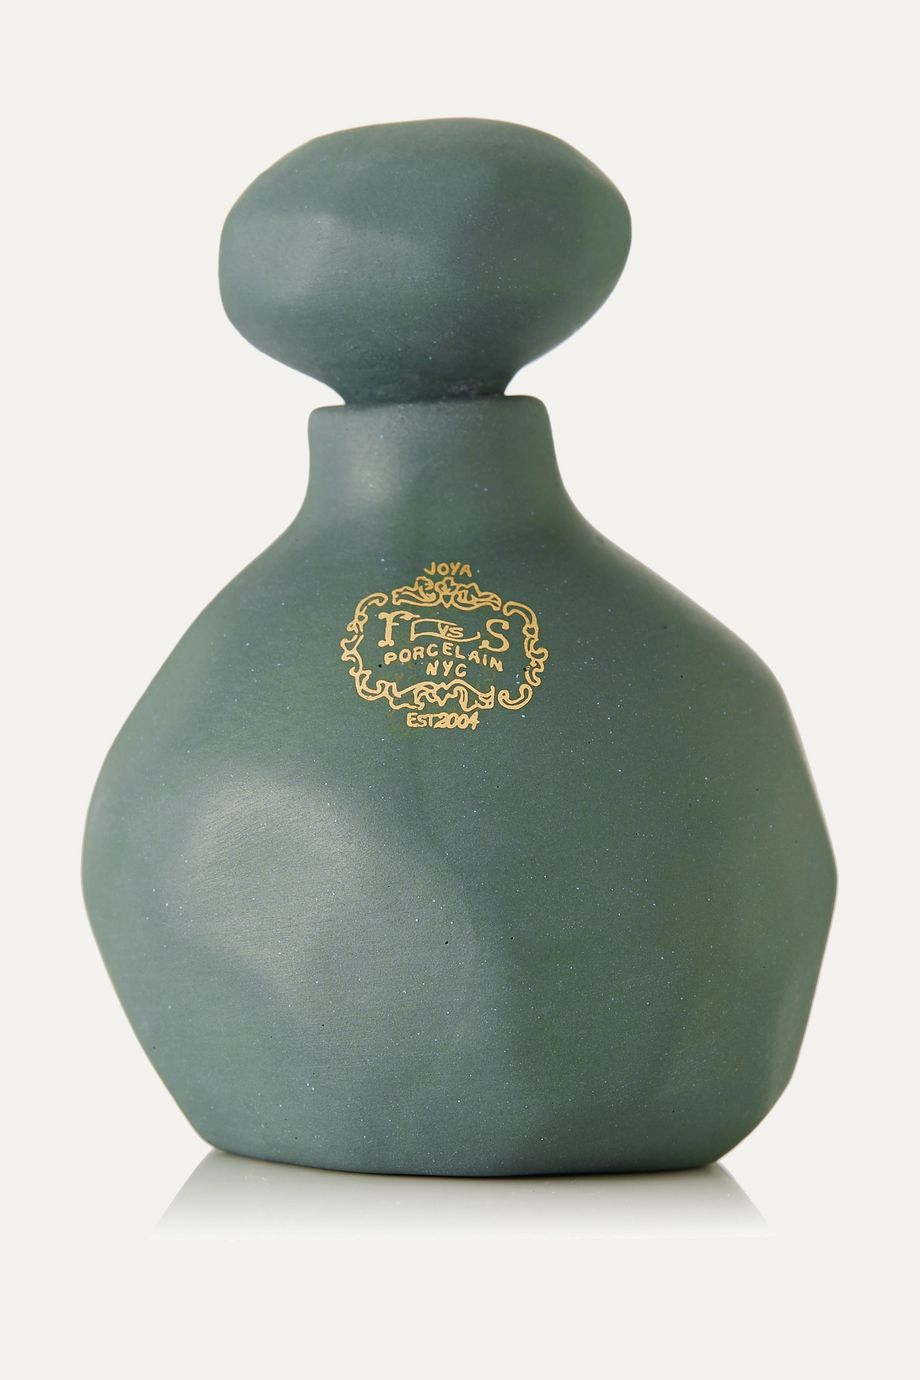 Joya FoxGlove Parfum - Blood Orange & Salt Meadow Grass, 75ml